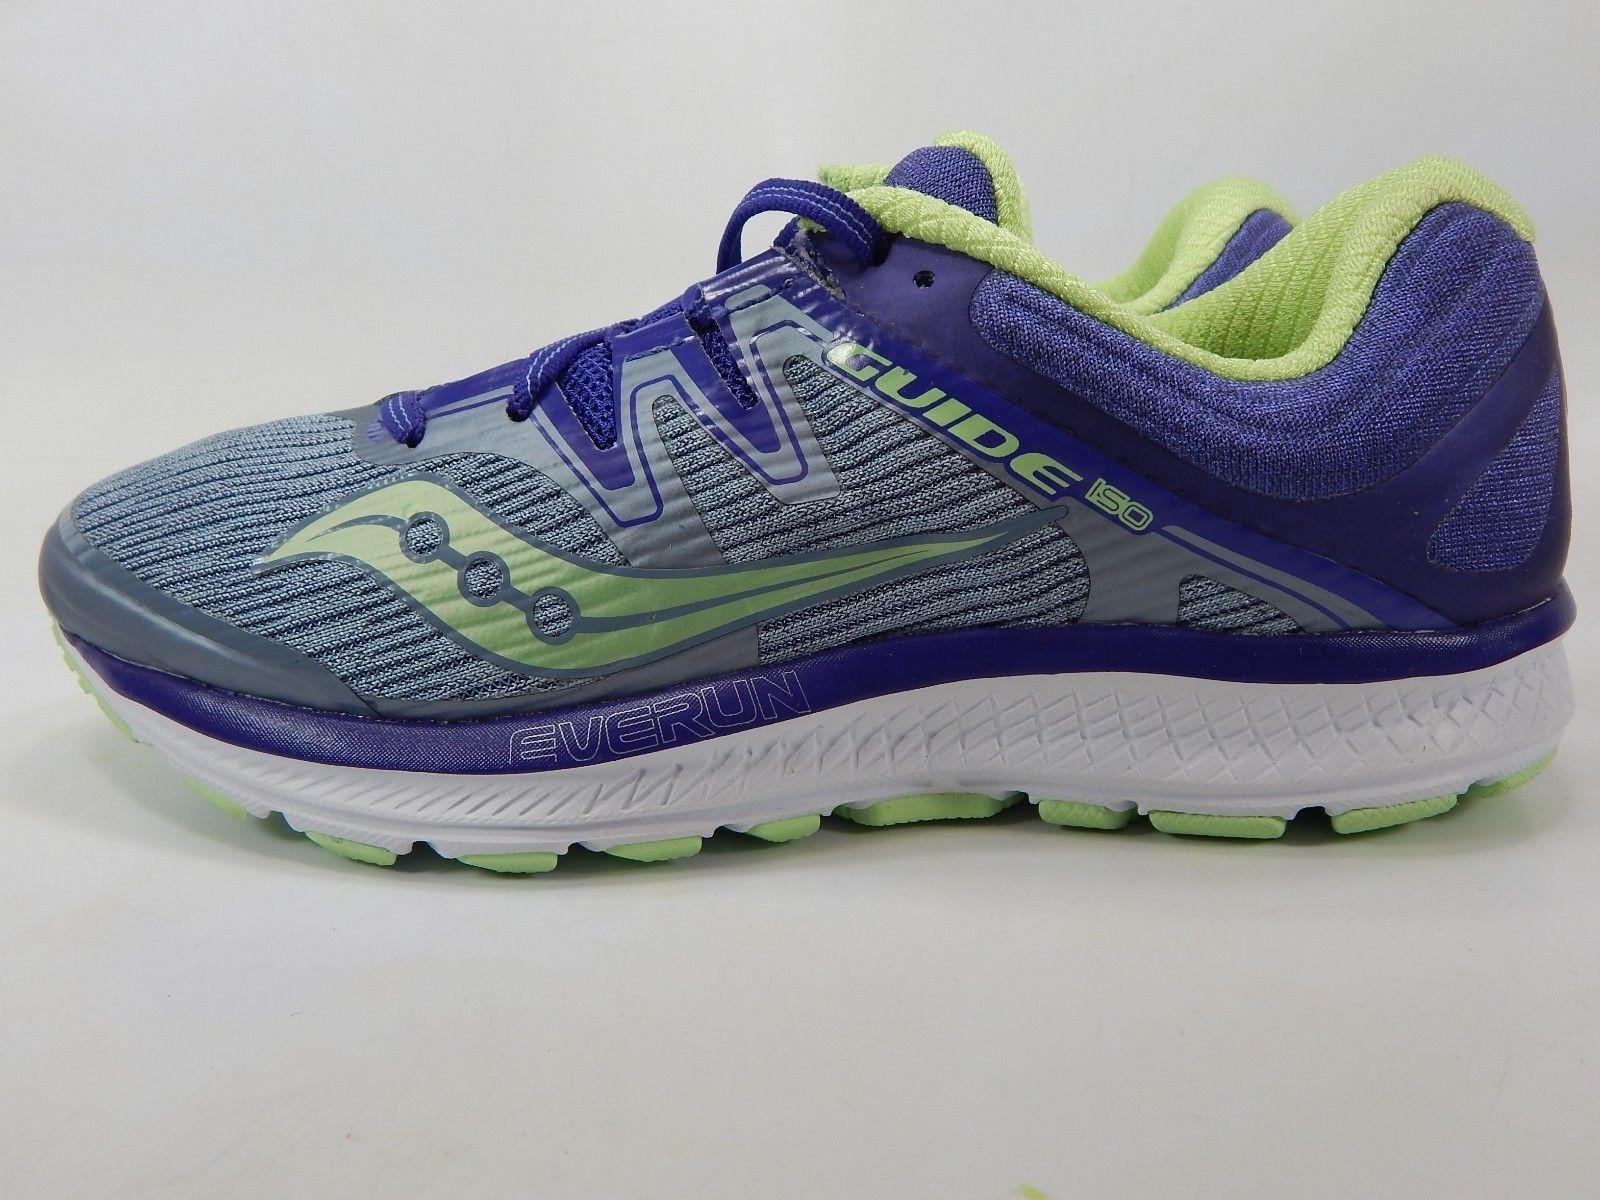 Saucony Guide ISO Size US 8 M (B) EU 39  Women's Running Shoes Purple S10415-1